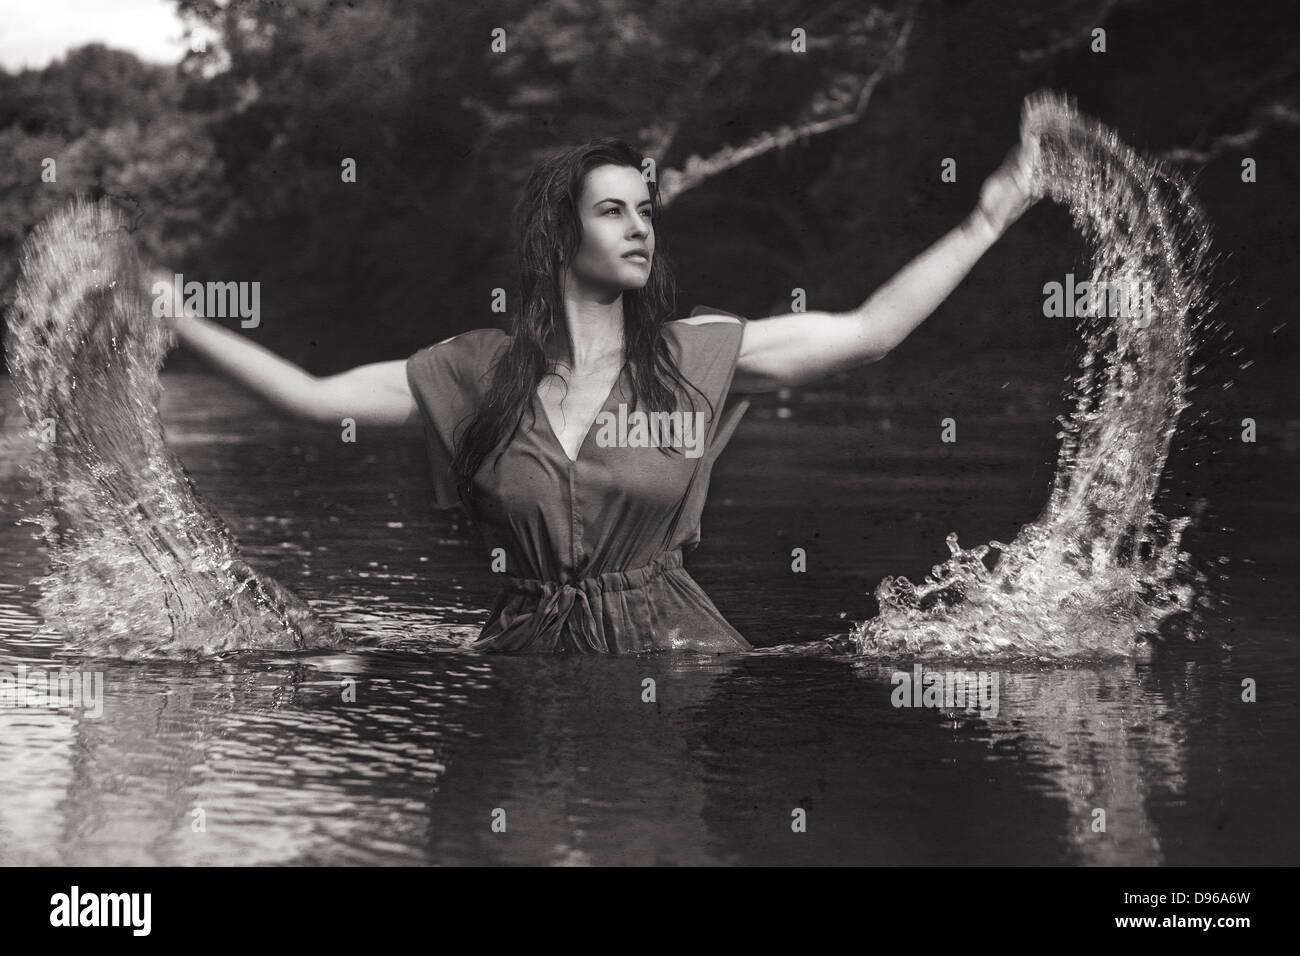 Woman splashing water out of river - Stock Image